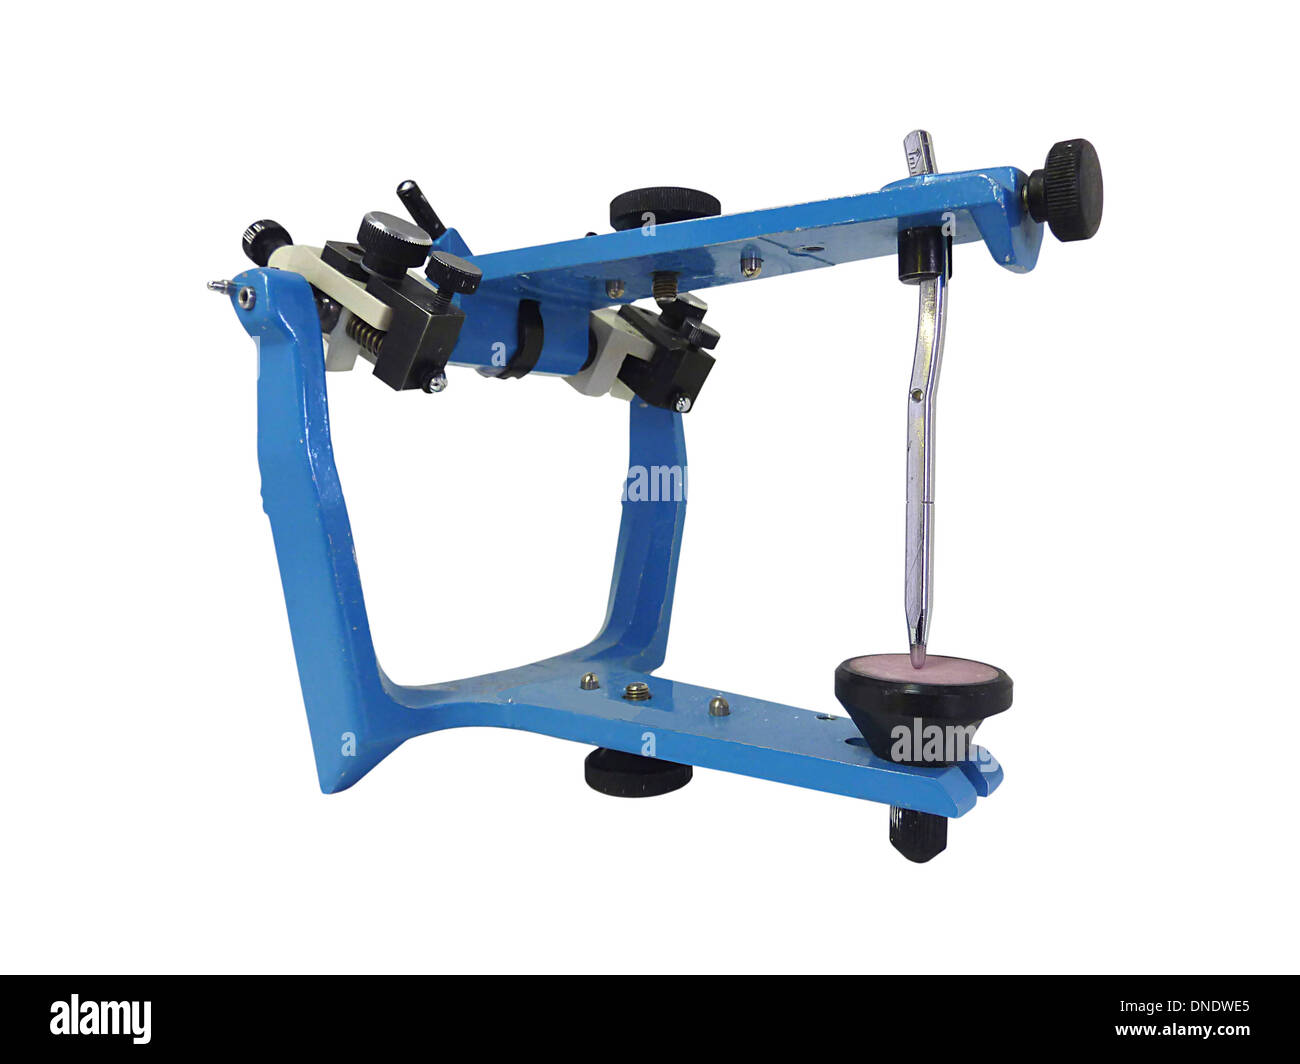 Blue metallic articulator used in dentistry. - Stock Image